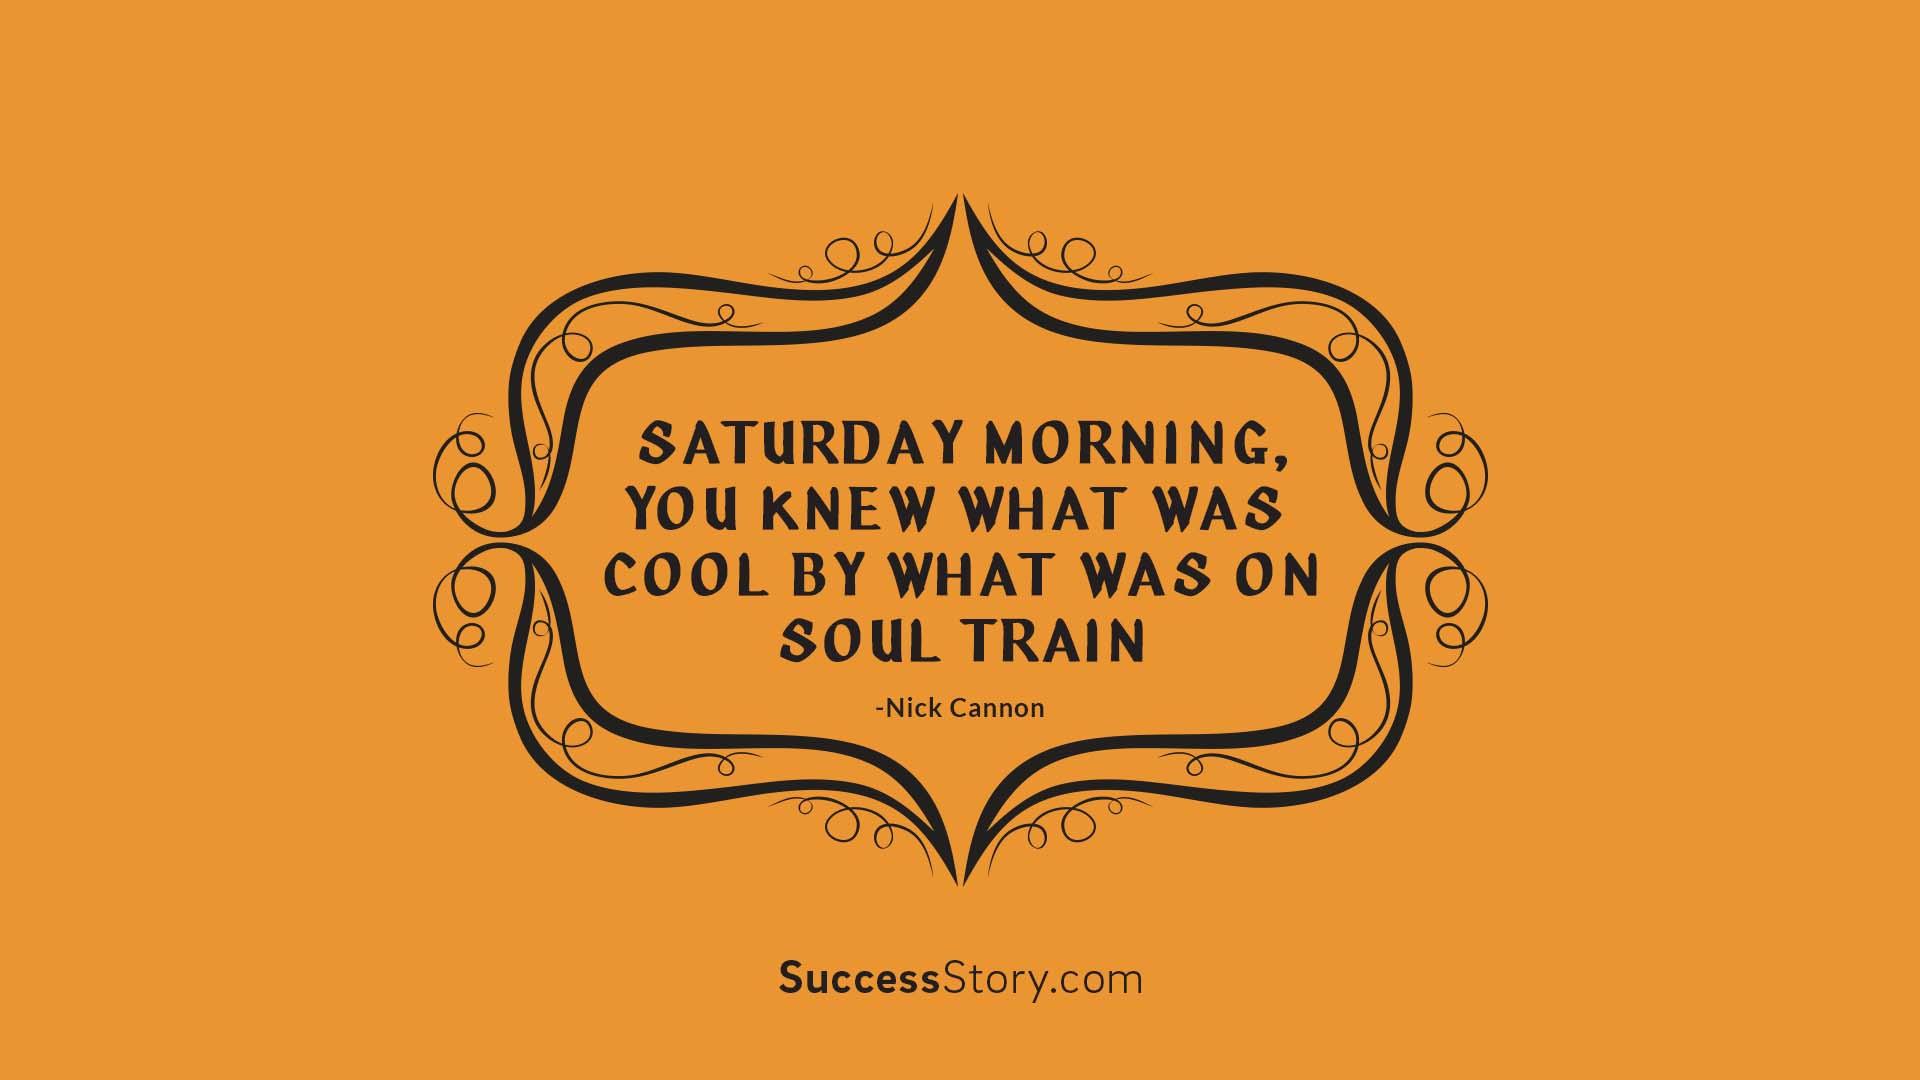 Saturday morning, you knew  1